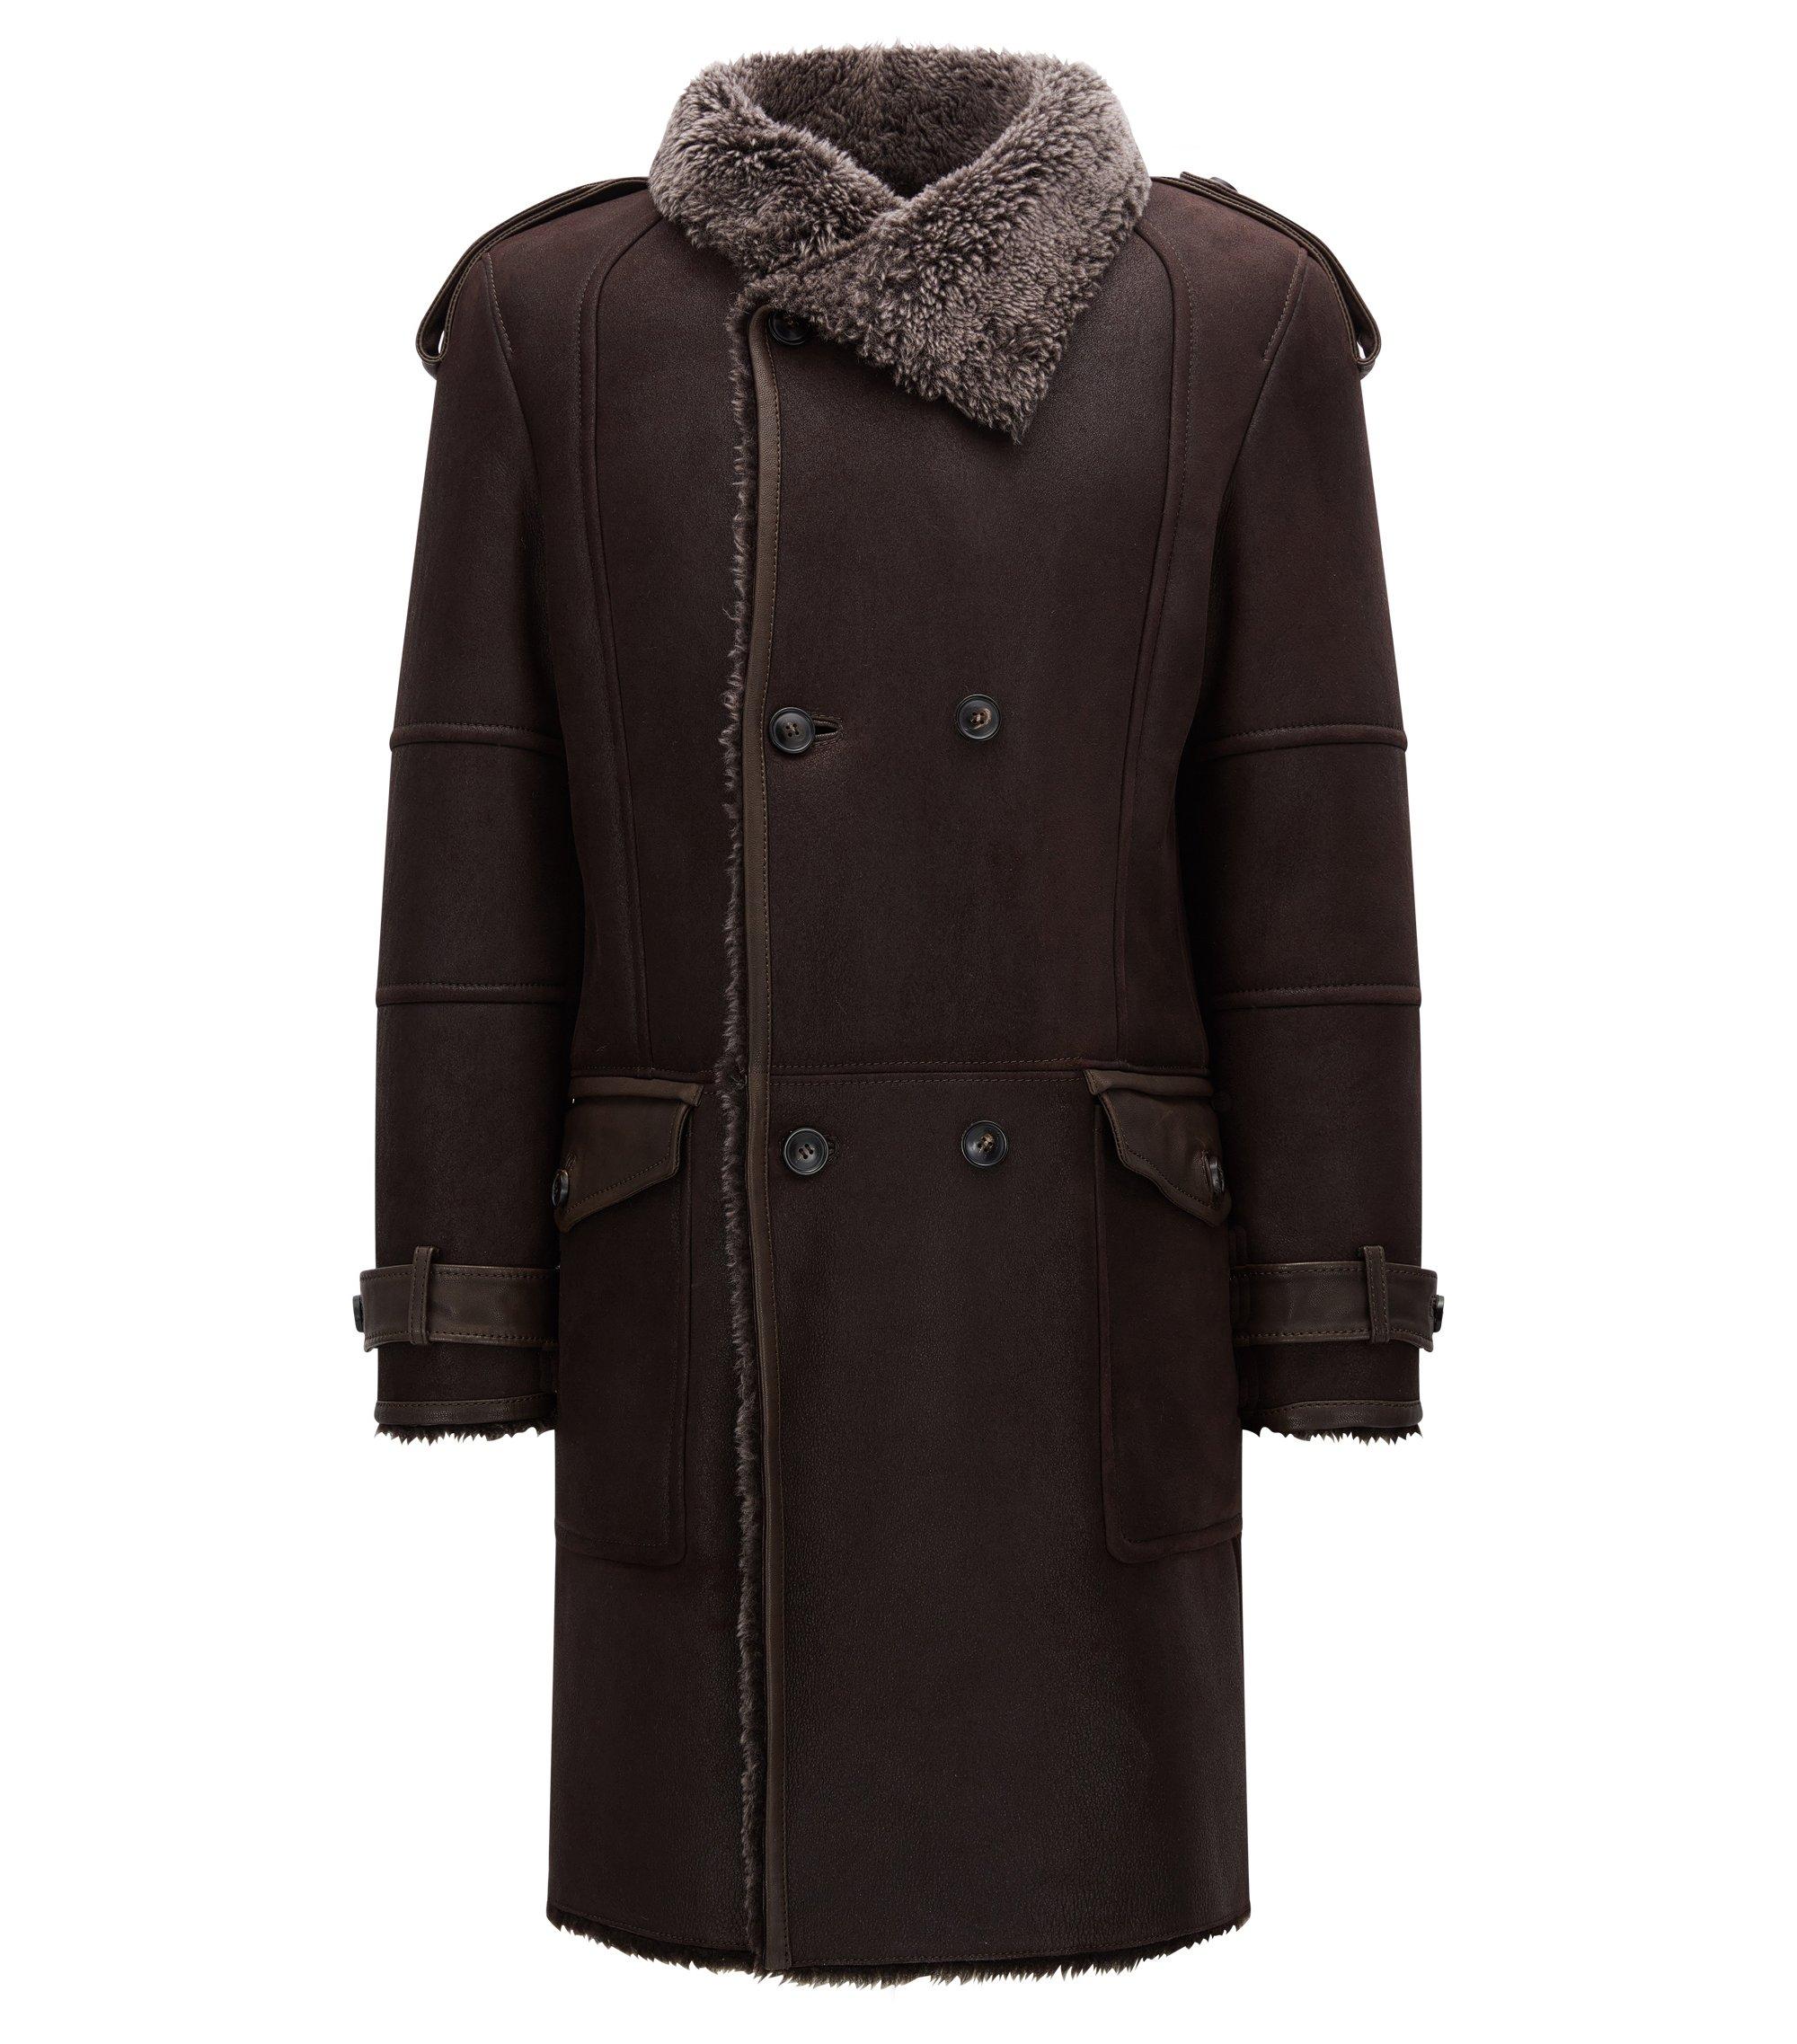 Zweireihiger Slim-Fit Mantel aus Lammfell, Dunkelbraun